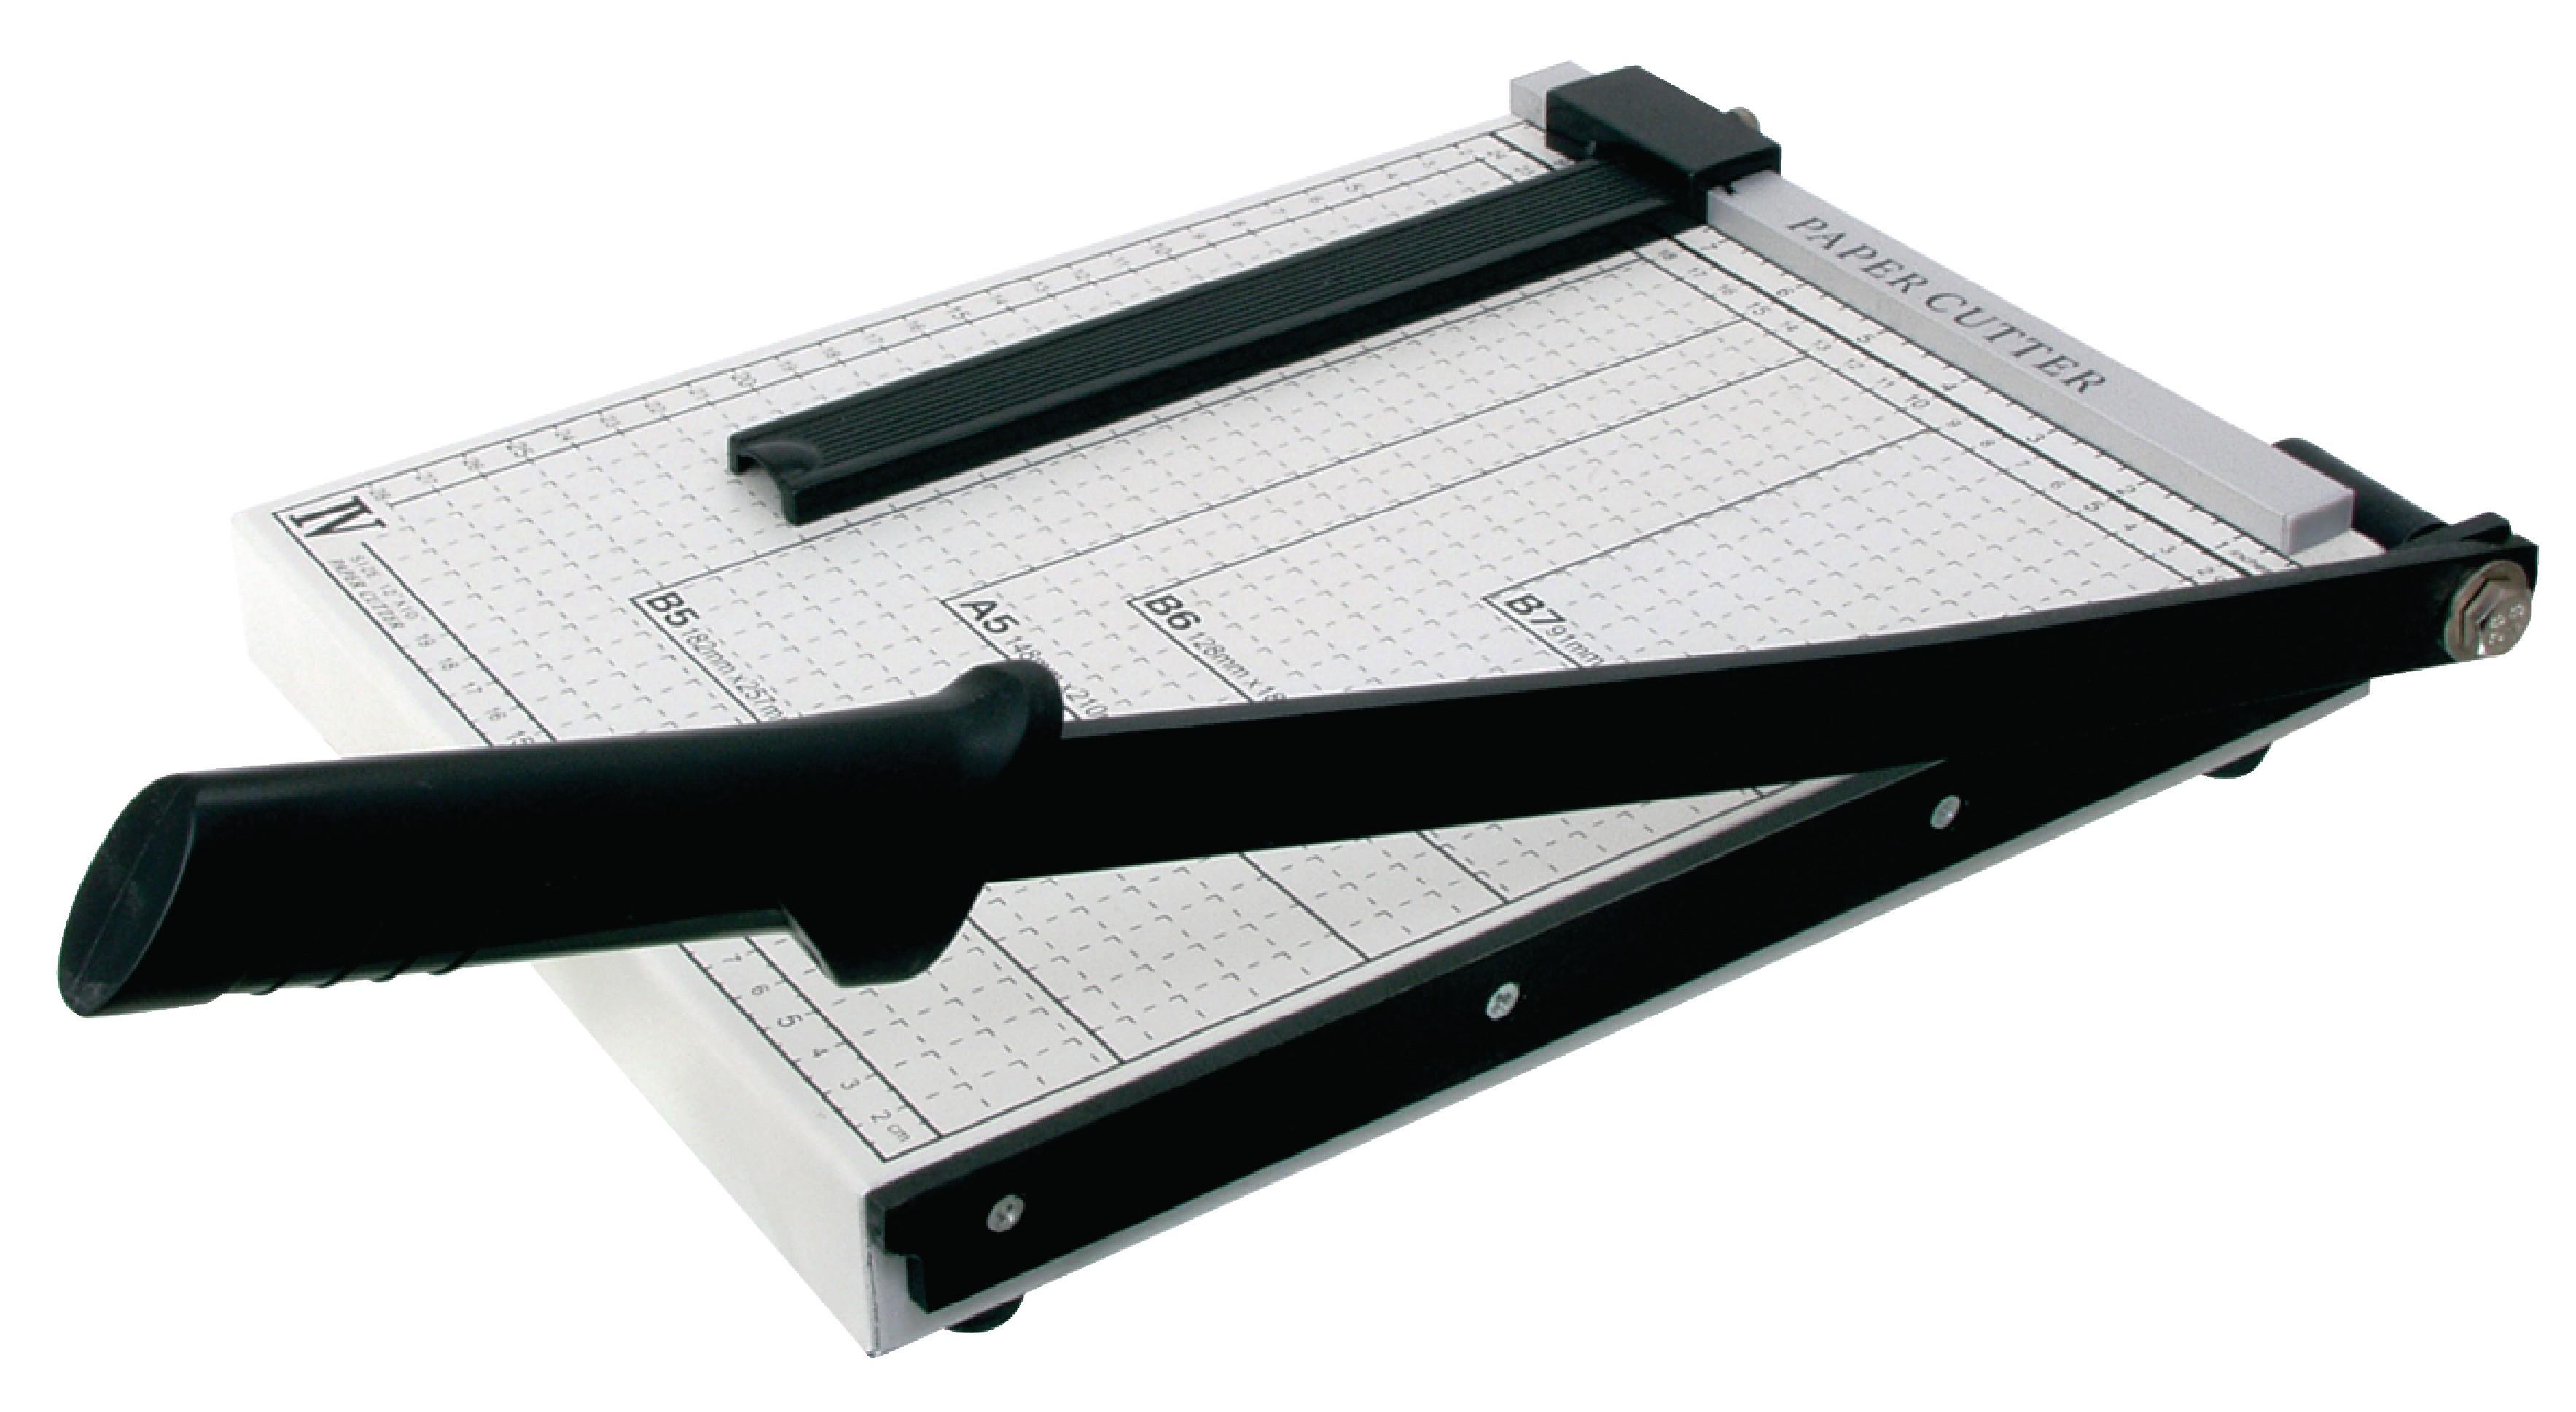 Páková řezačka na papír A4, KÖNIG KN-CM10N